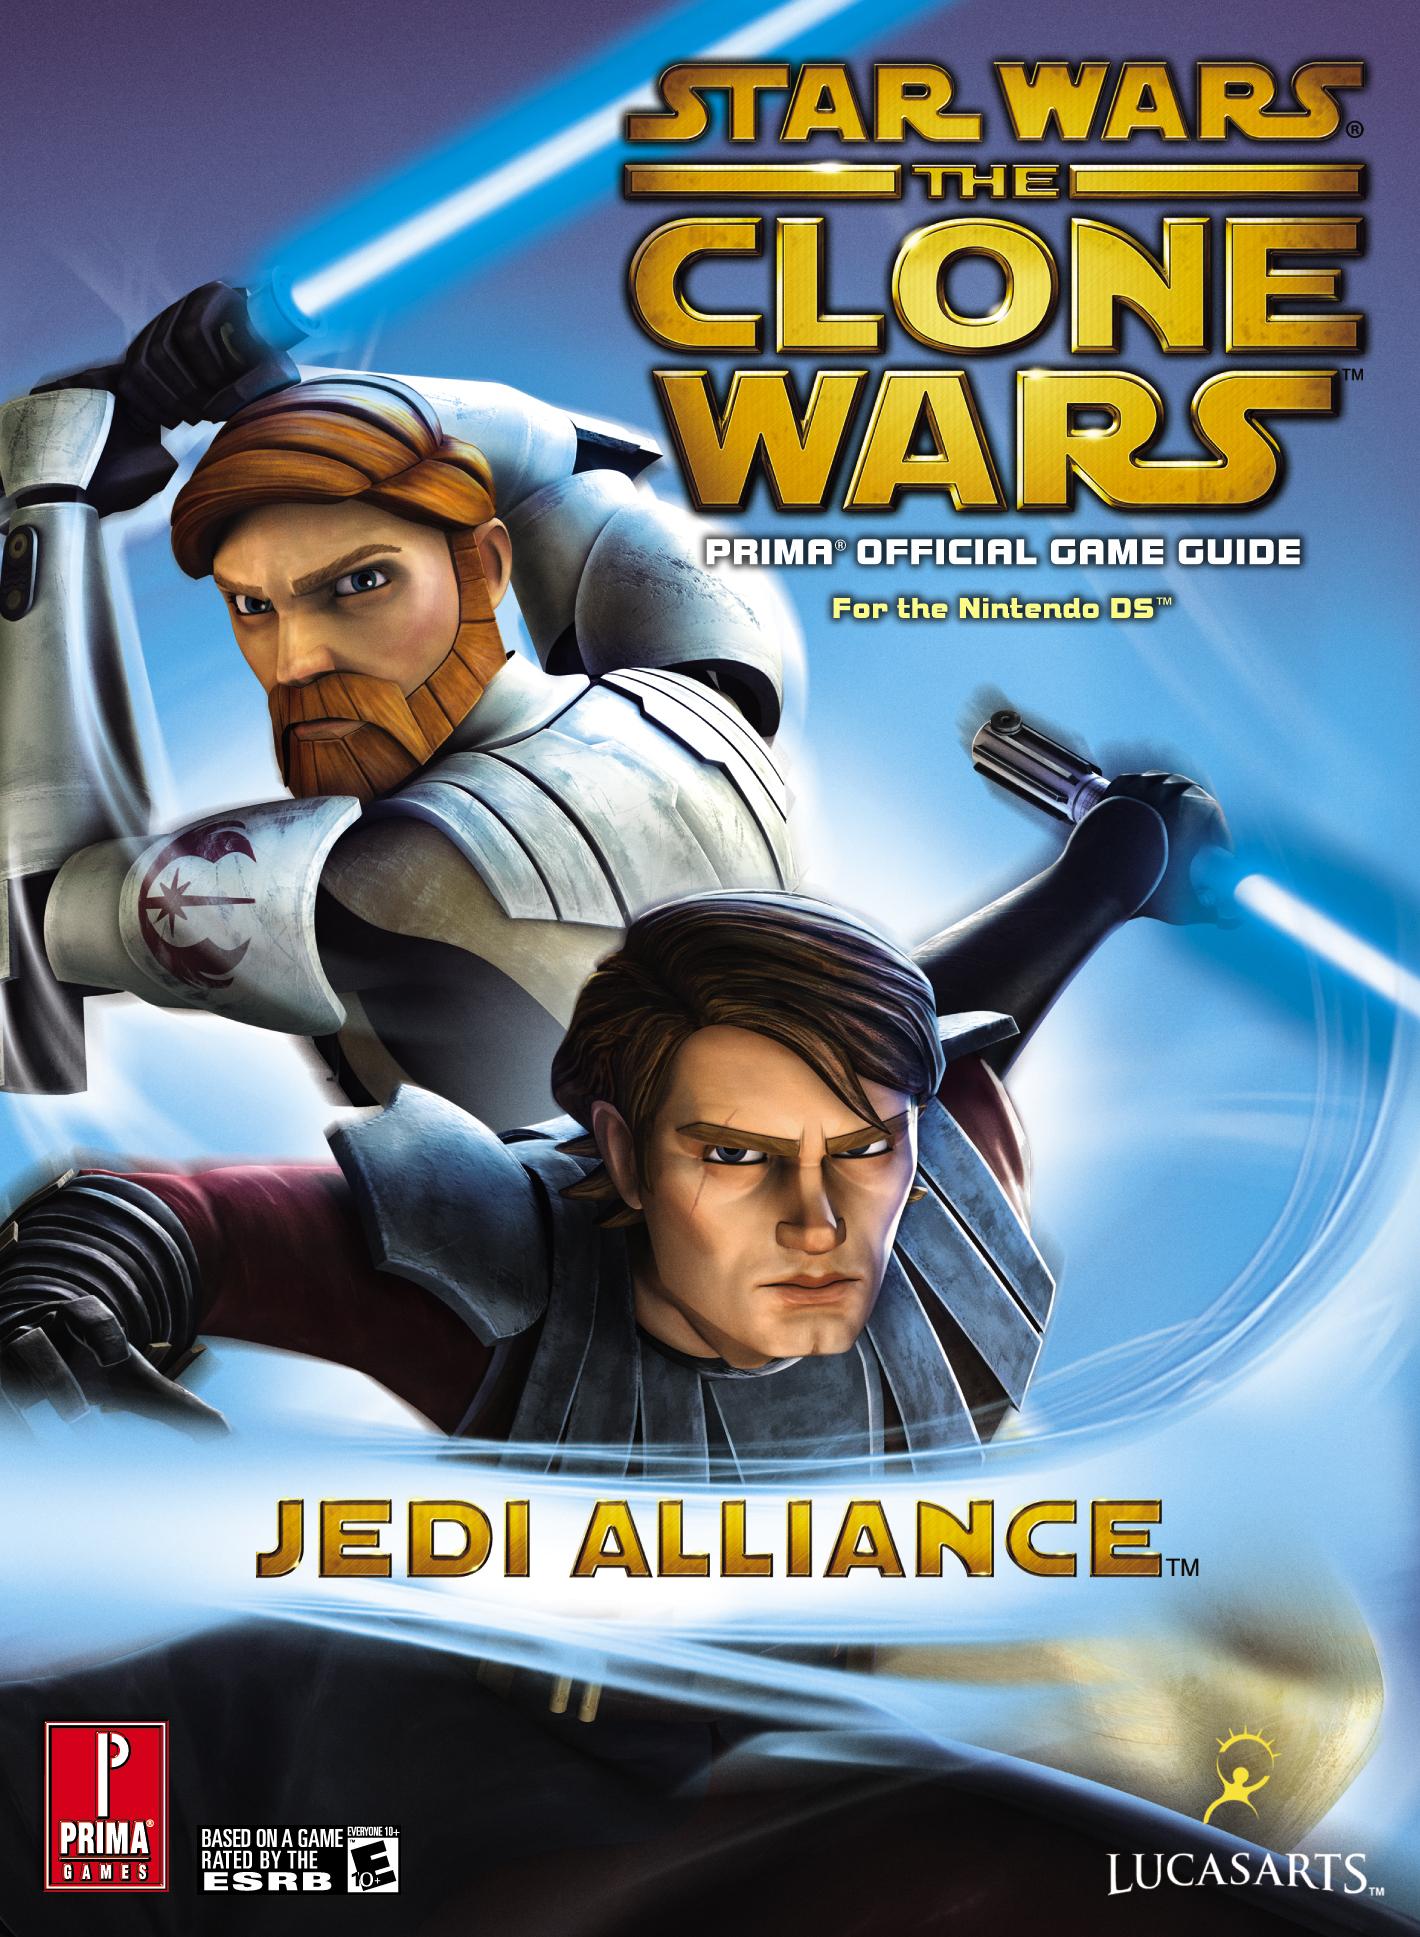 Star Wars: The Clone Wars: Jedi Alliance: Официальное игровое руководство Prima